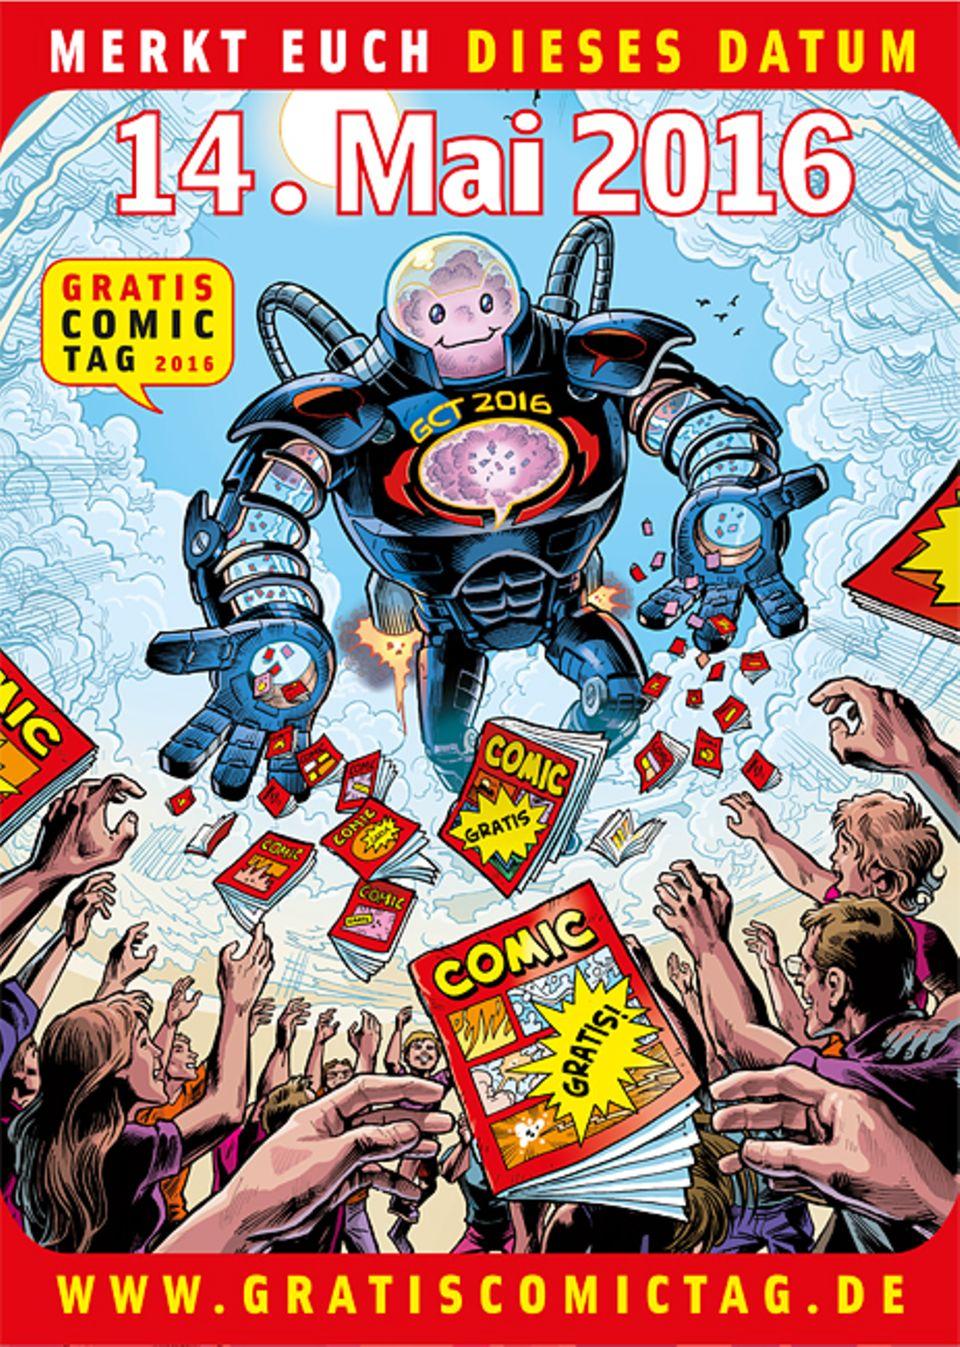 Comics: Am 14. Mai 2016 ist Gratis Comic Tag!